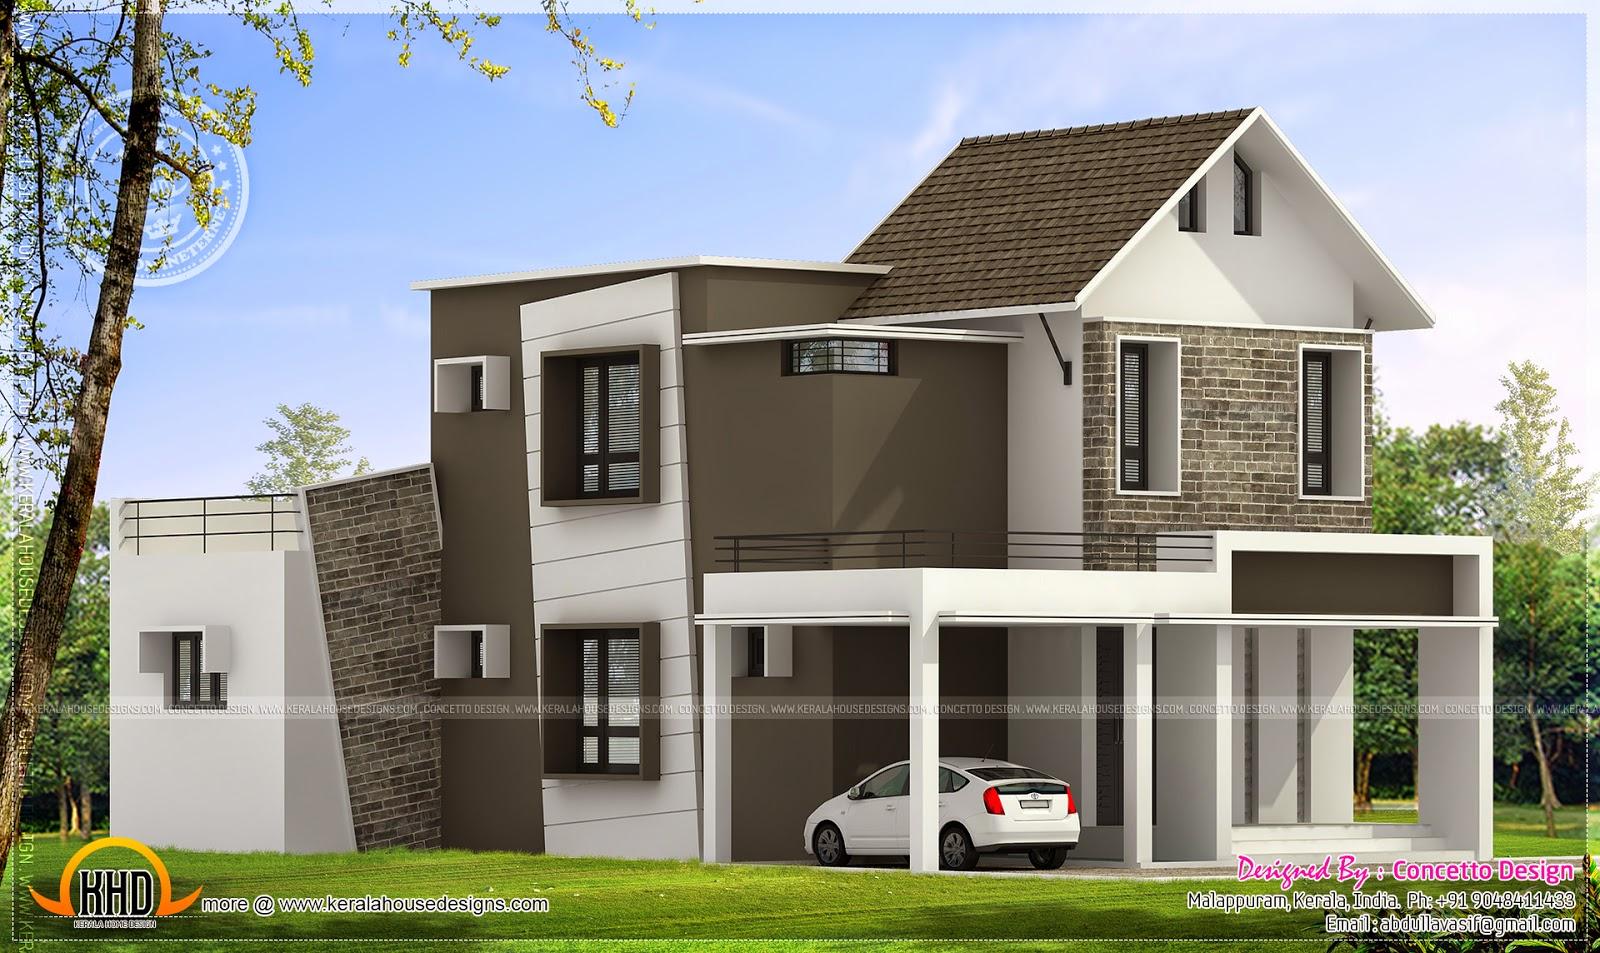 sq yard house exterior designs square feet house plans square feet house plans ideal spaces